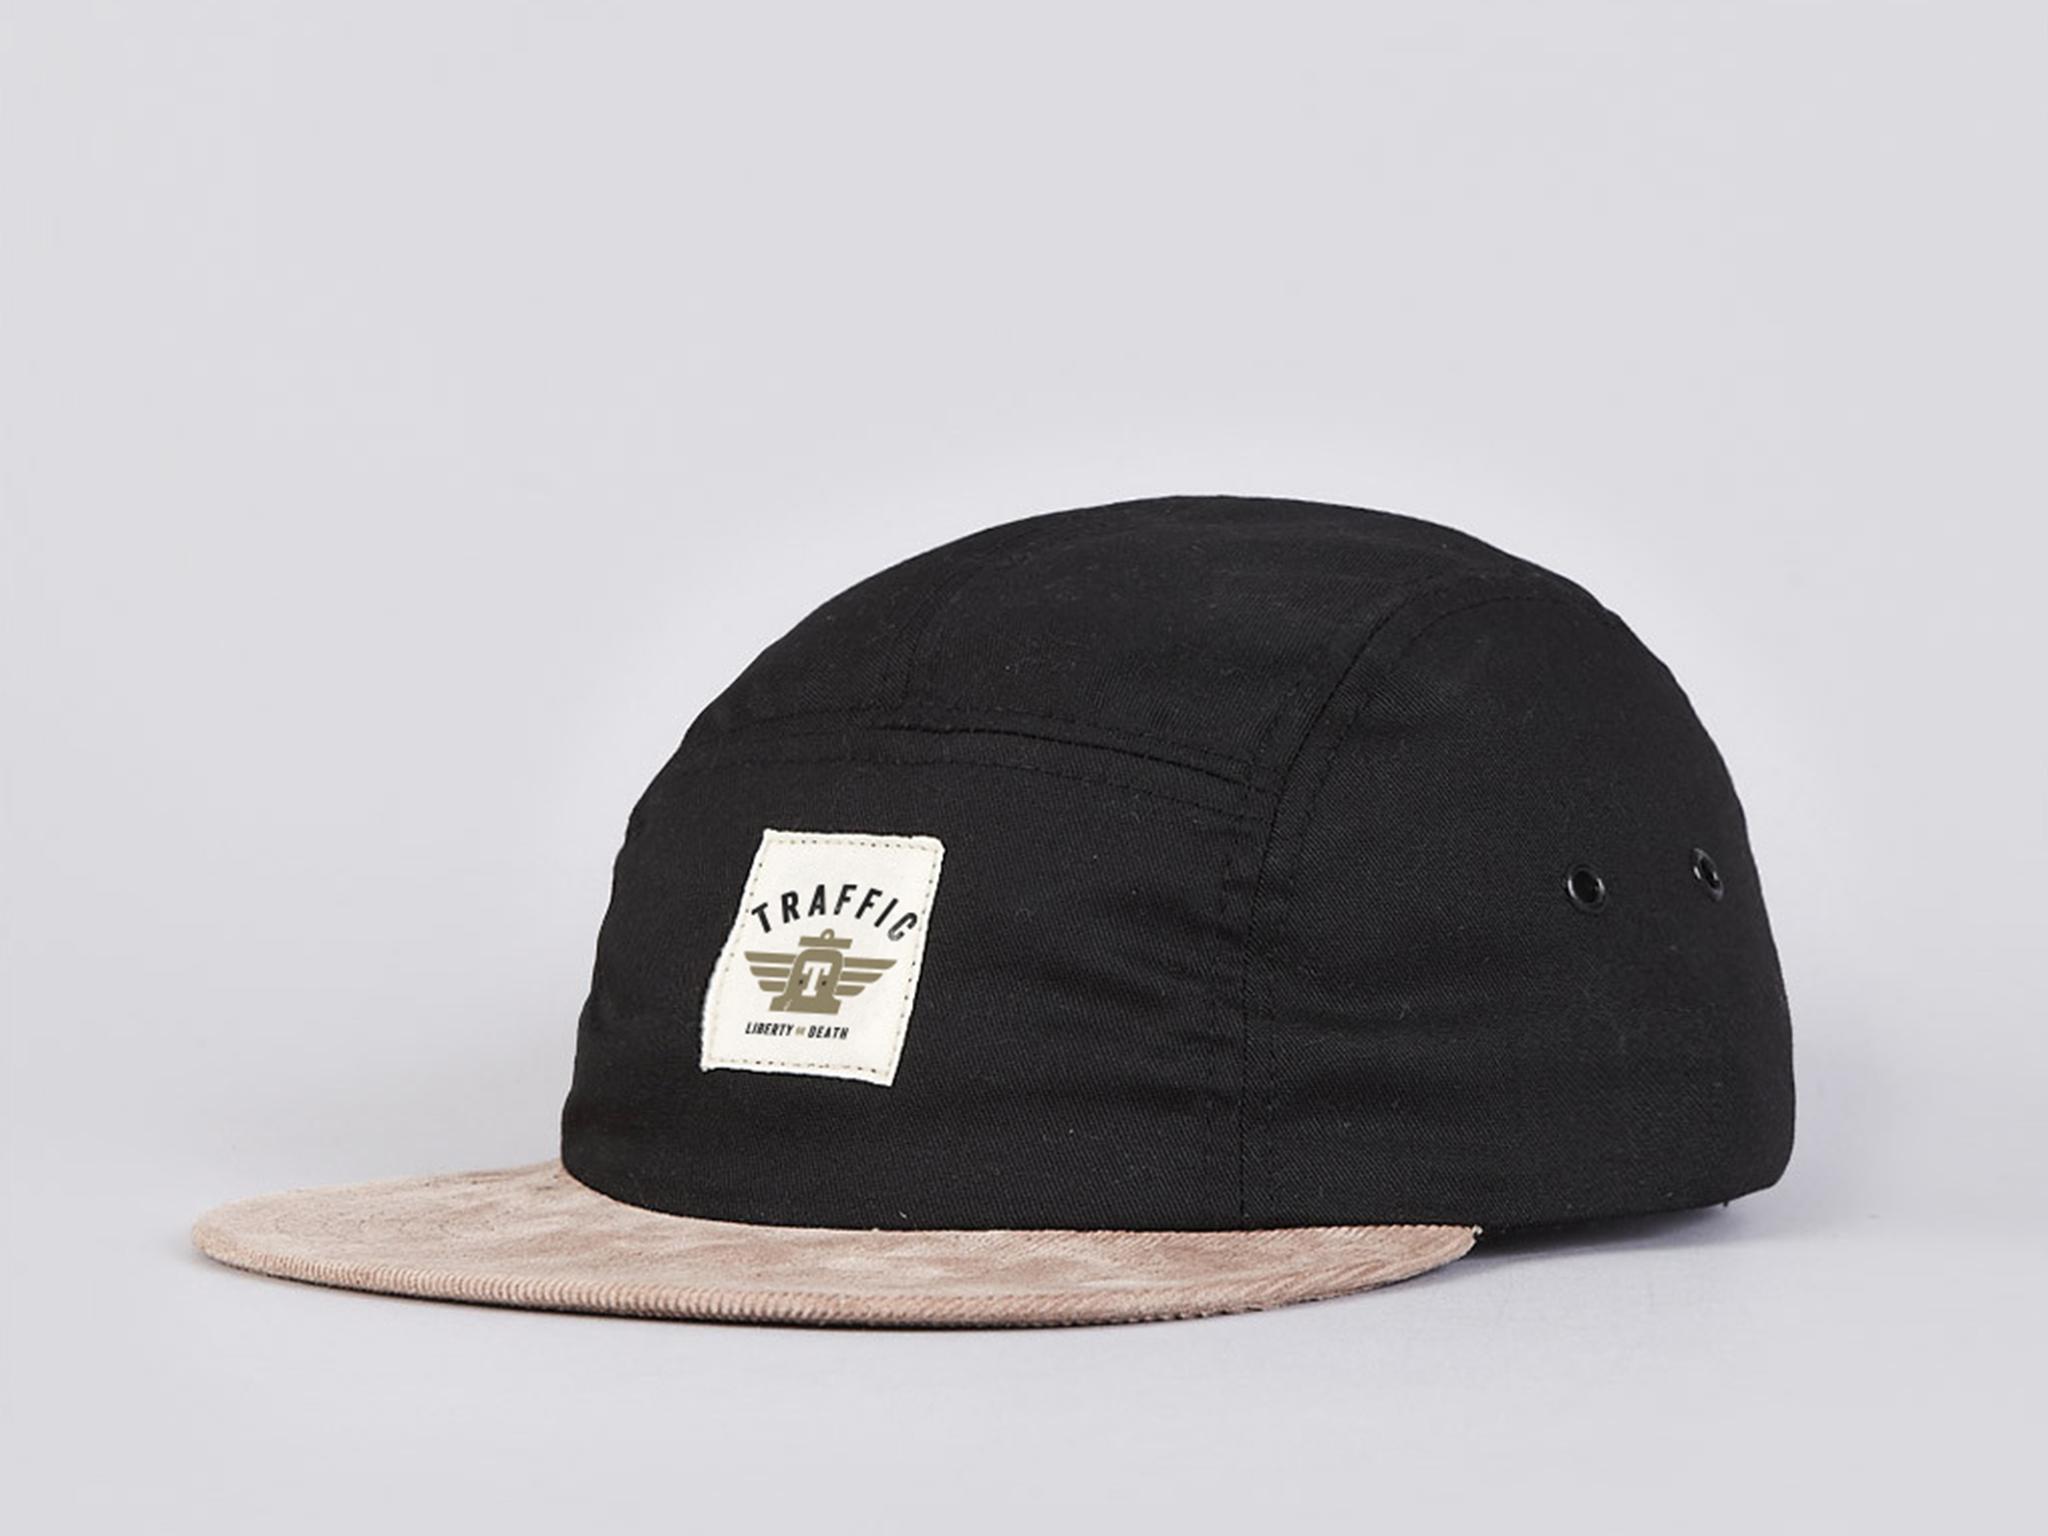 Traffic_Apparel_H_0005_Liberty-HAT-Black+Tan.jpg